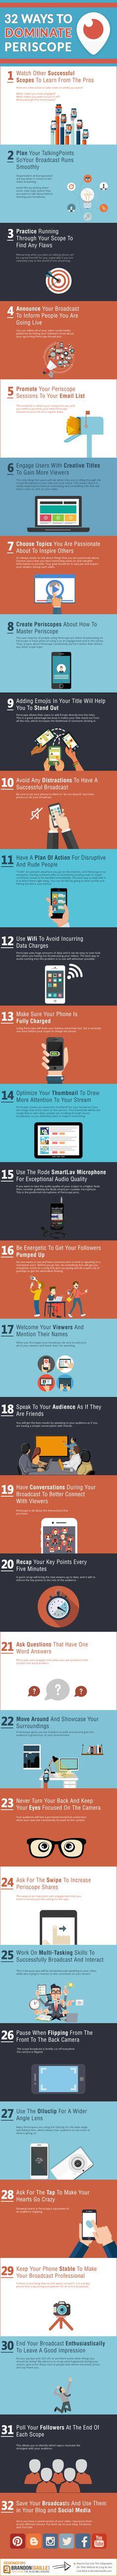 32 Ways to Dominate Periscope - @visualistan